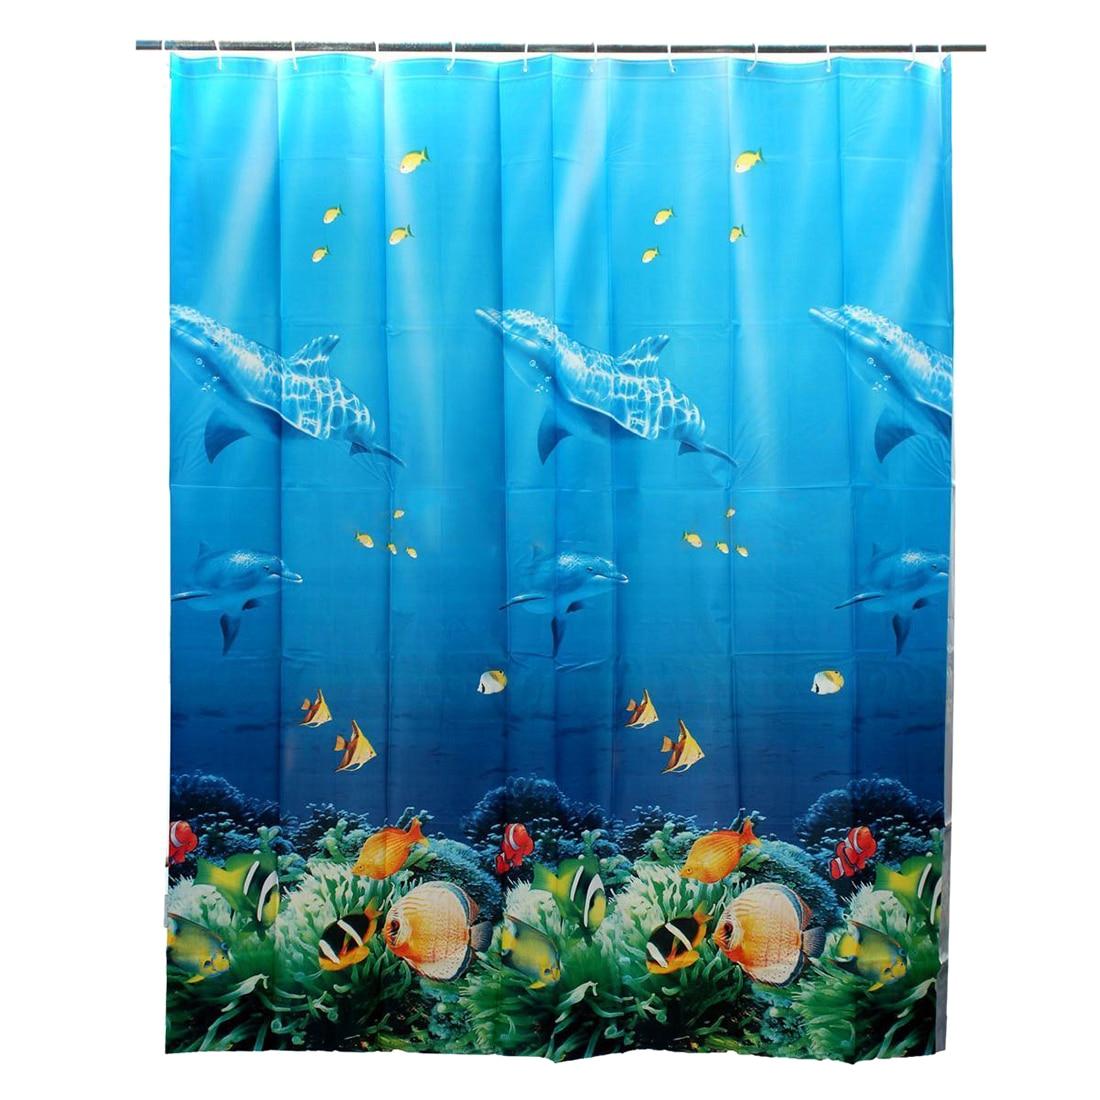 Ocean shower curtains - Practical 180x180cm Tropical Beach Sea Dolphin Fish Ocean Color Shower Curtain With Hooks